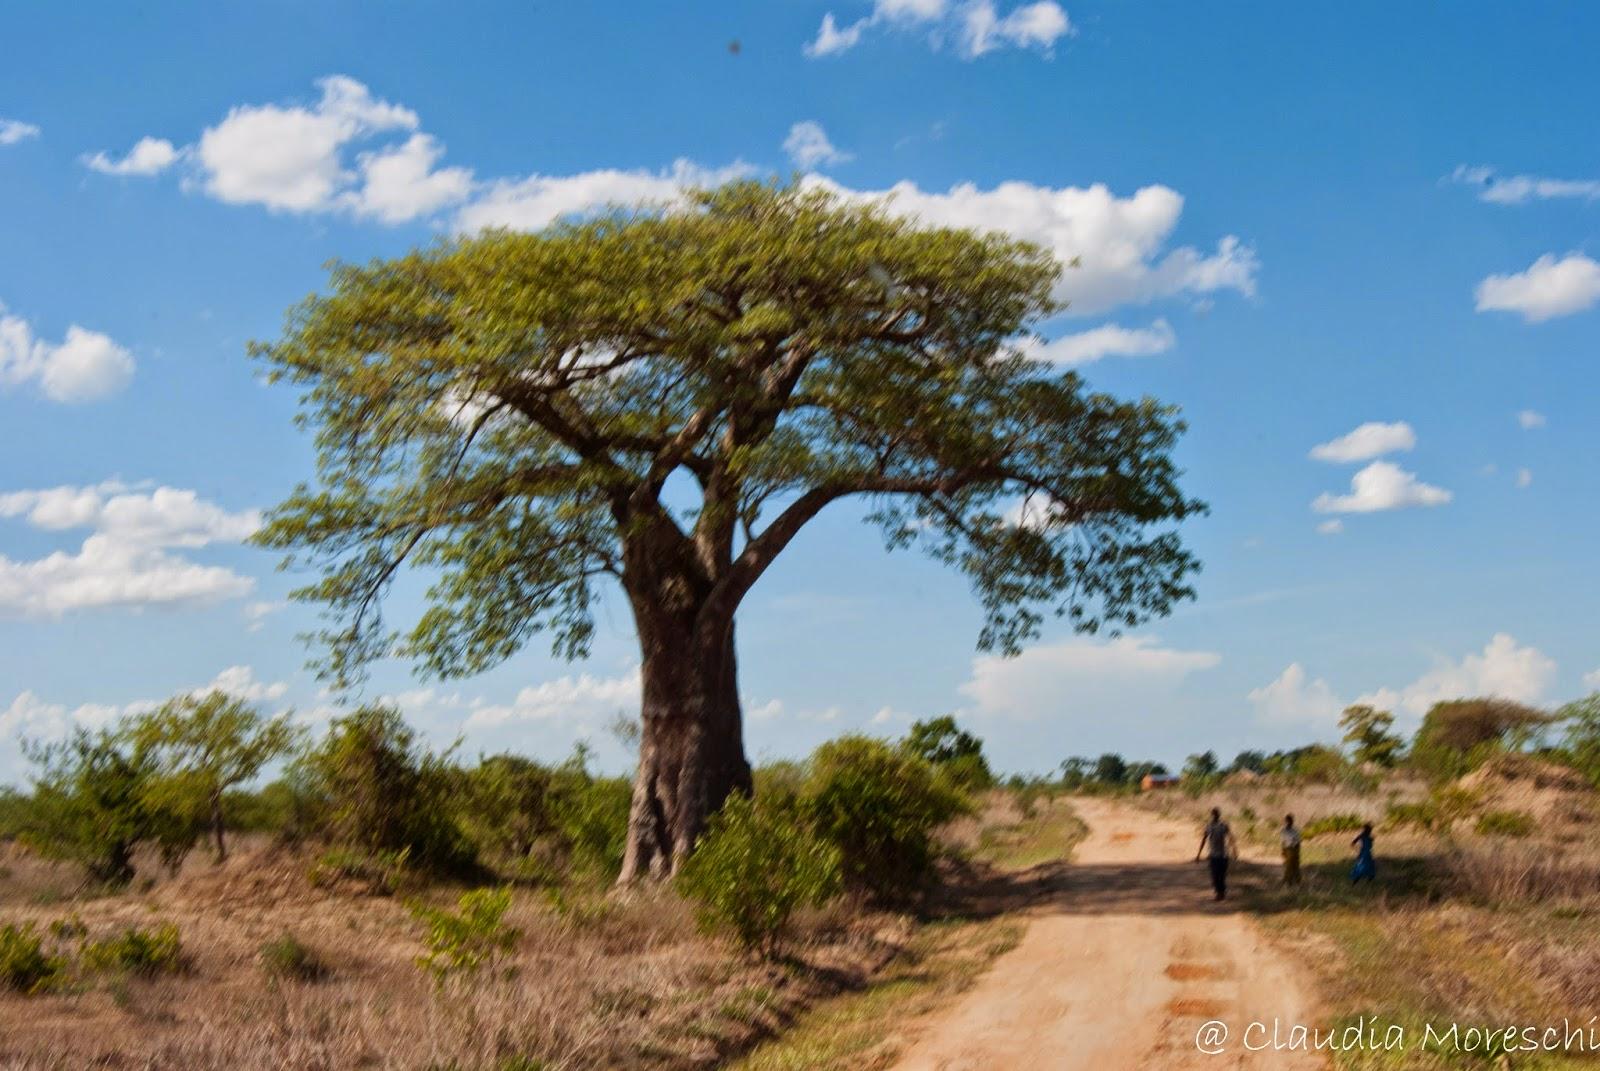 Malawi incontri personali